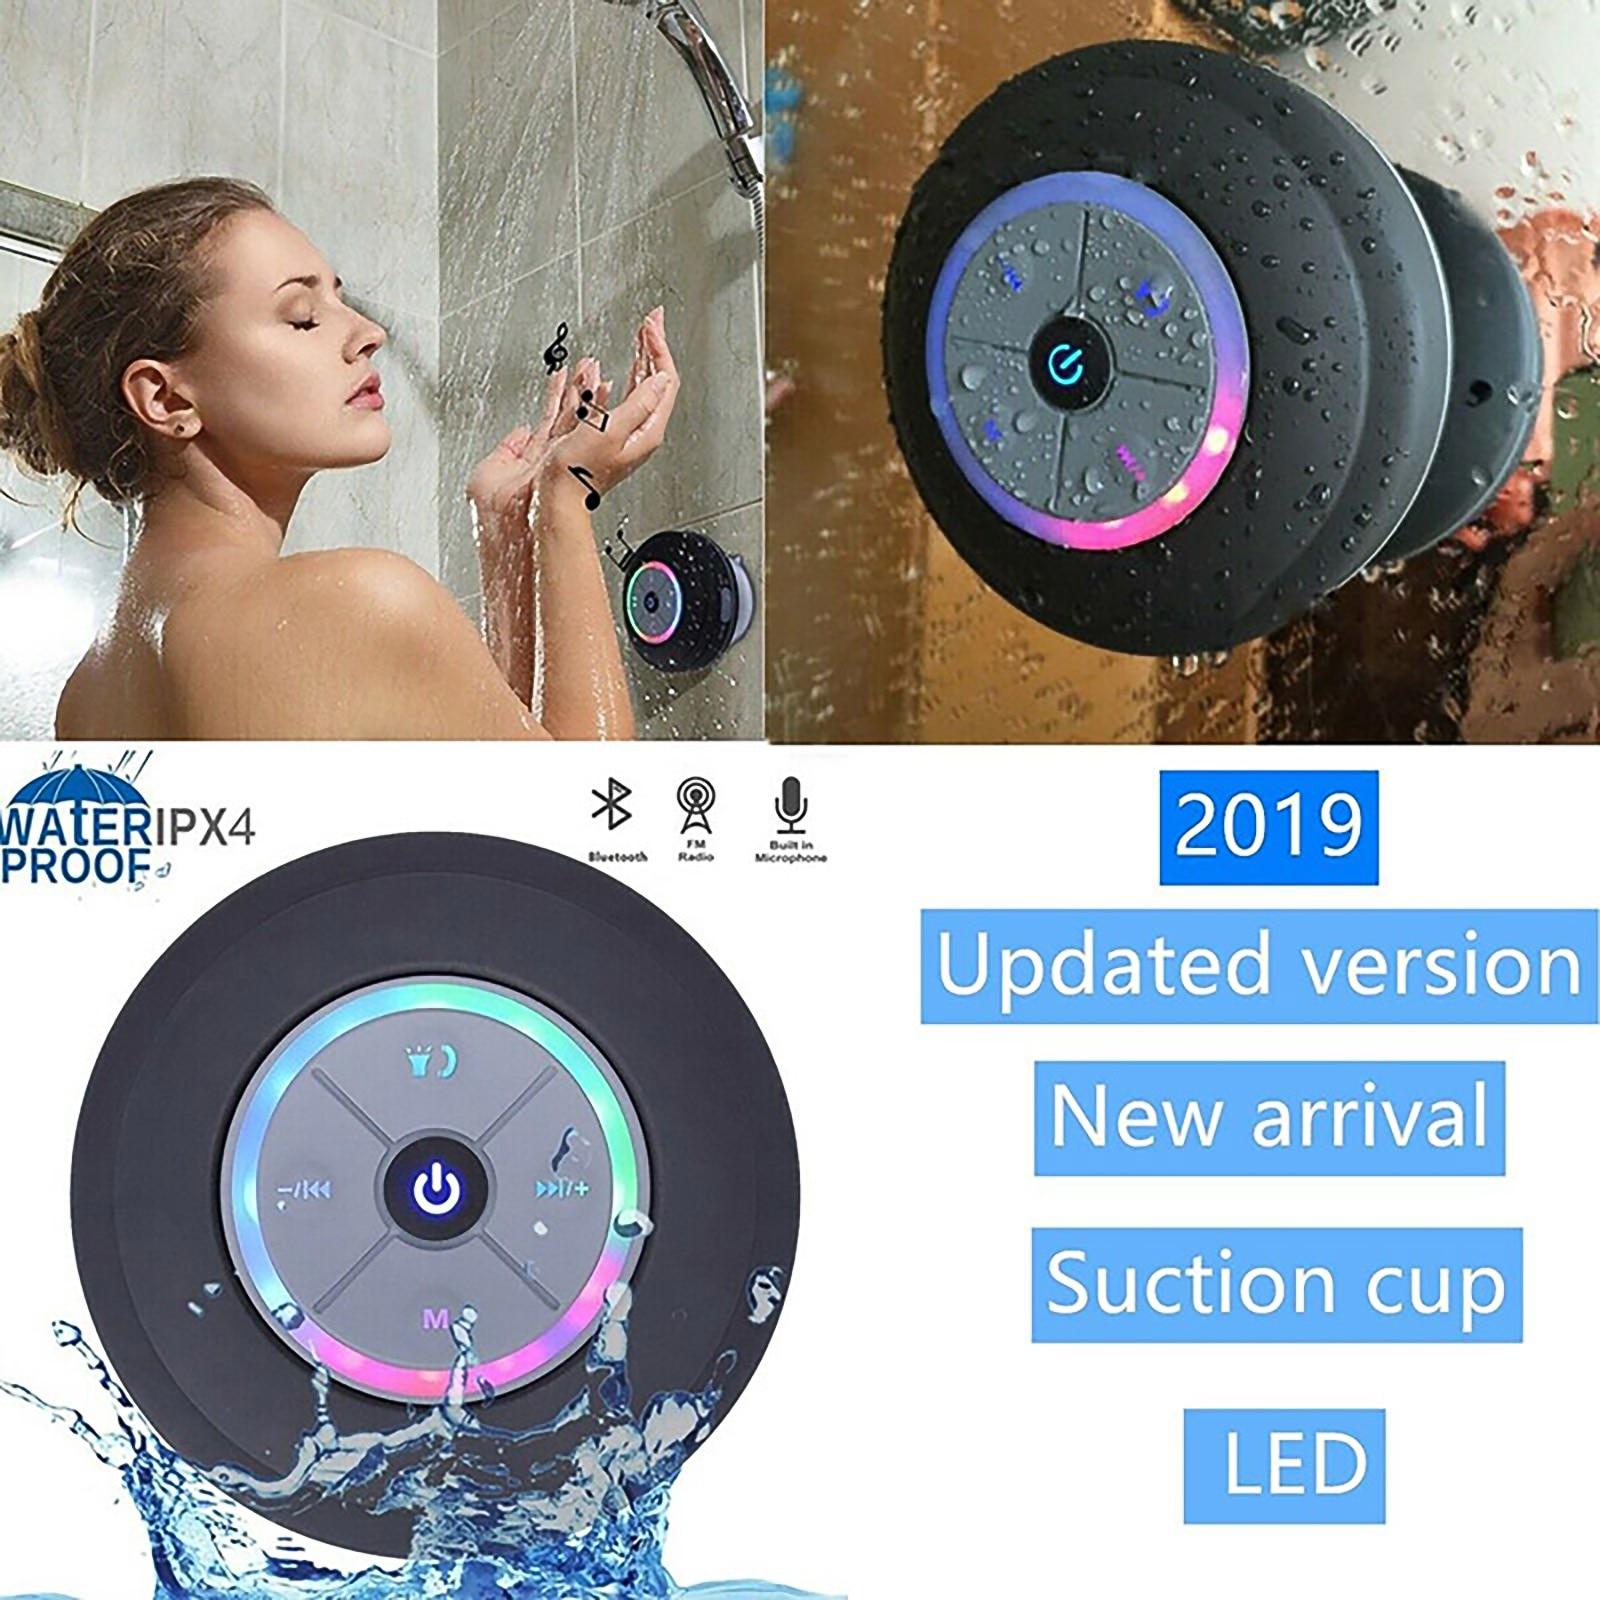 Wireless Portable Bluetooth Speaker Waterproof Bluetooth Shower Speaker Hands-Free Car Portable Speaker Card Reader And FM Radio